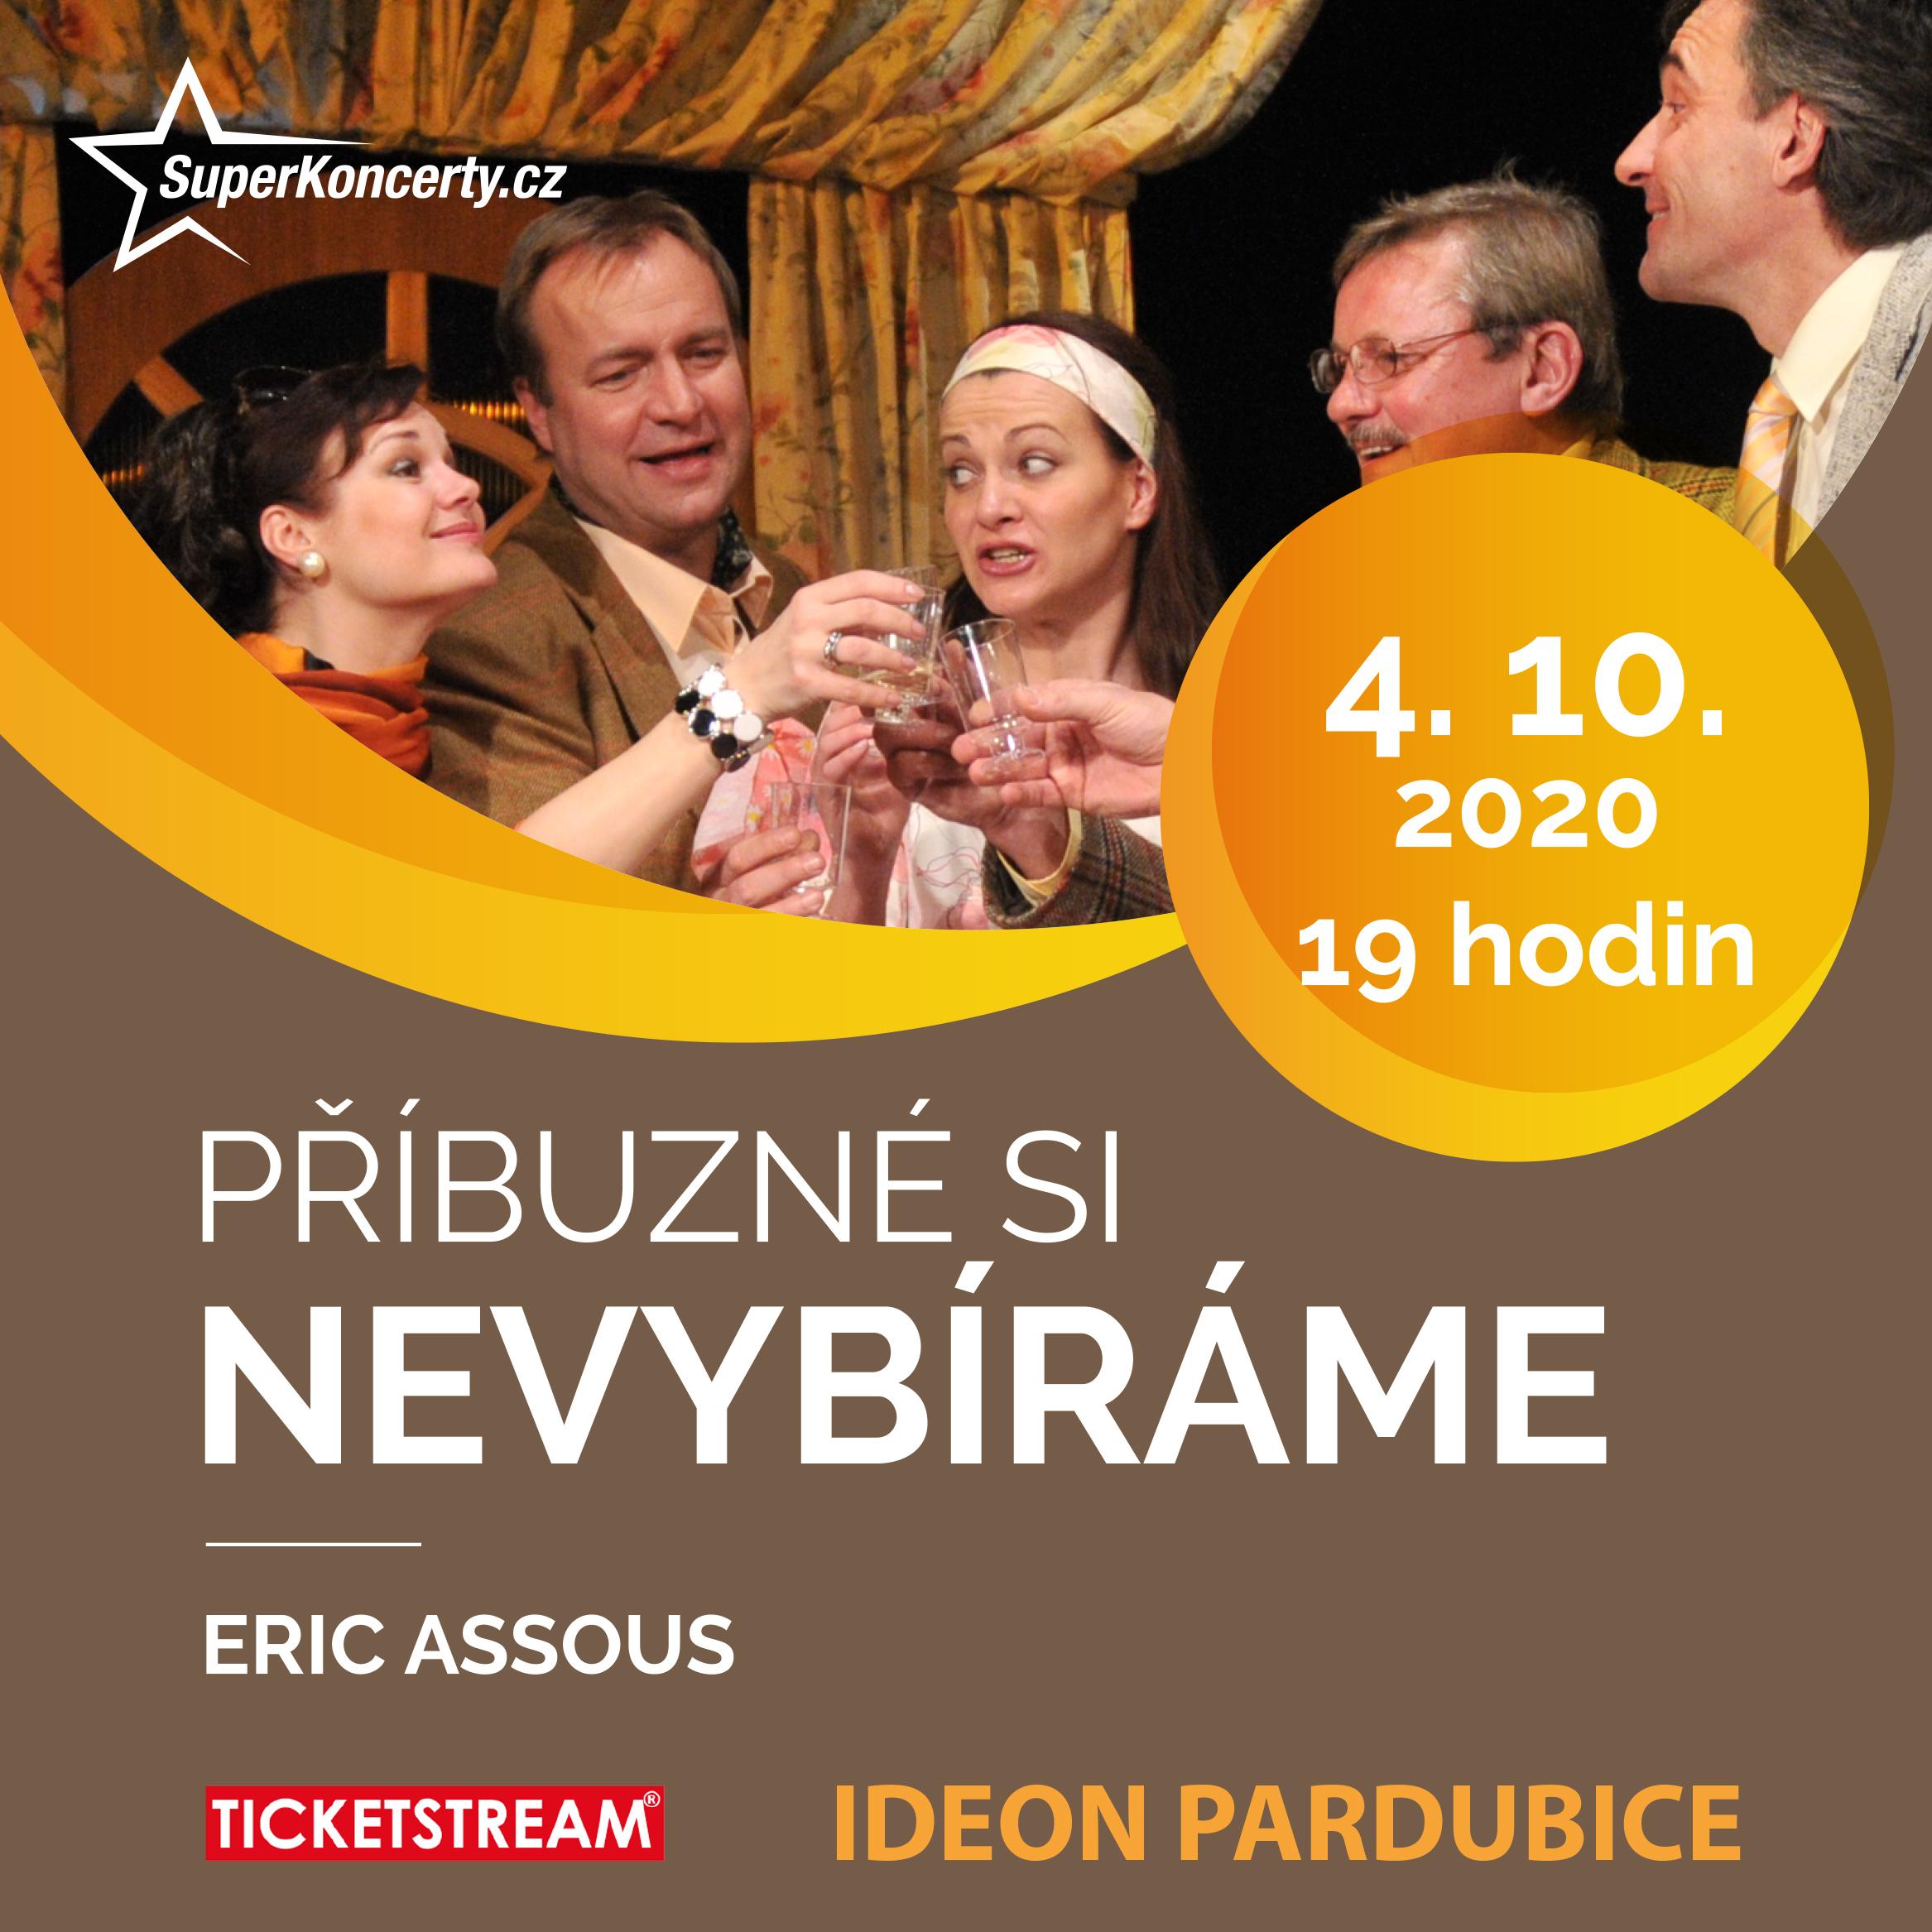 PŘÍBUZNÉ SI NEVYBÍRÁME-  Pardubice  -Ideon   Pardubice